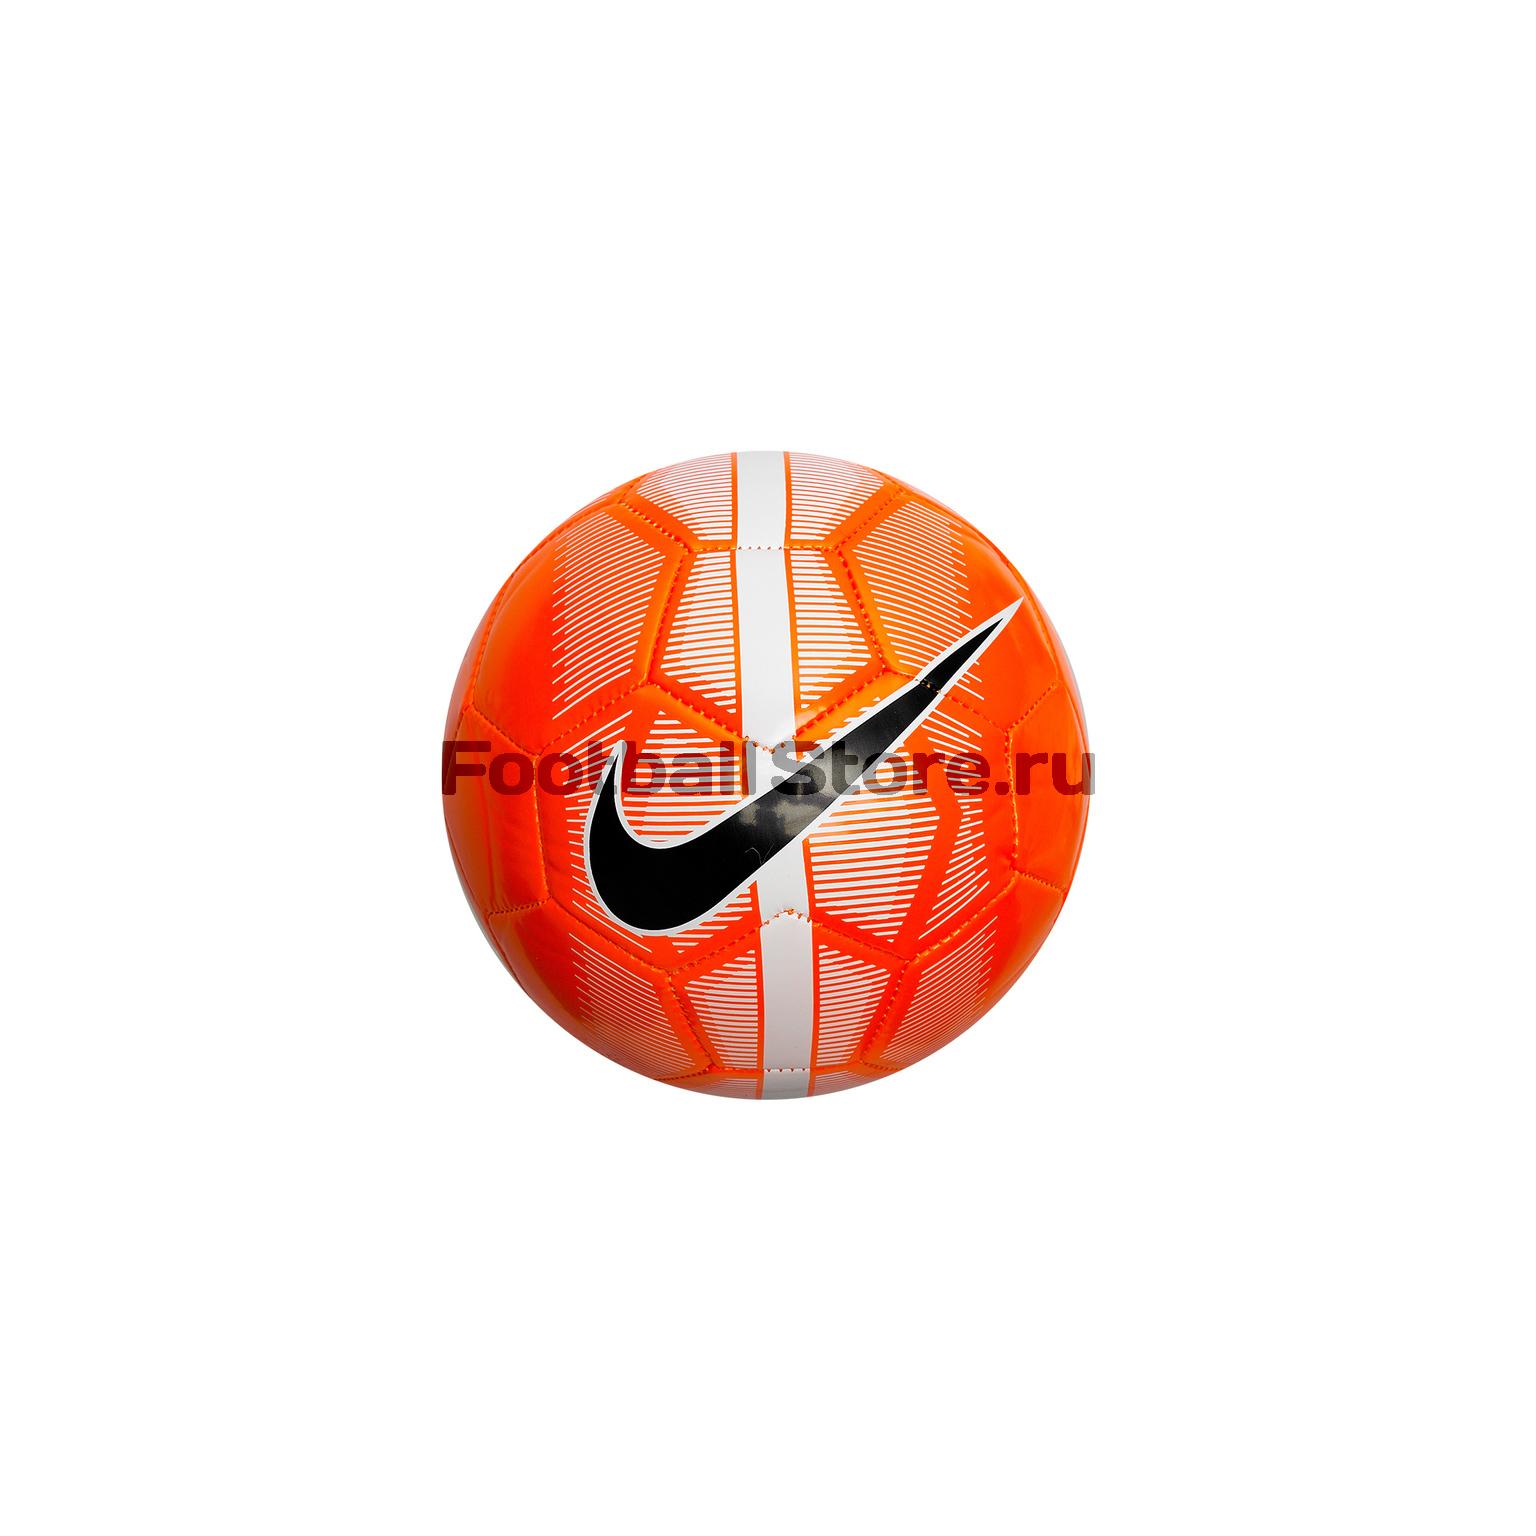 Мяч сувенирный Nike Mercurial Skills SC3340-809 nike nike fc zoom mercurial xi flyknit